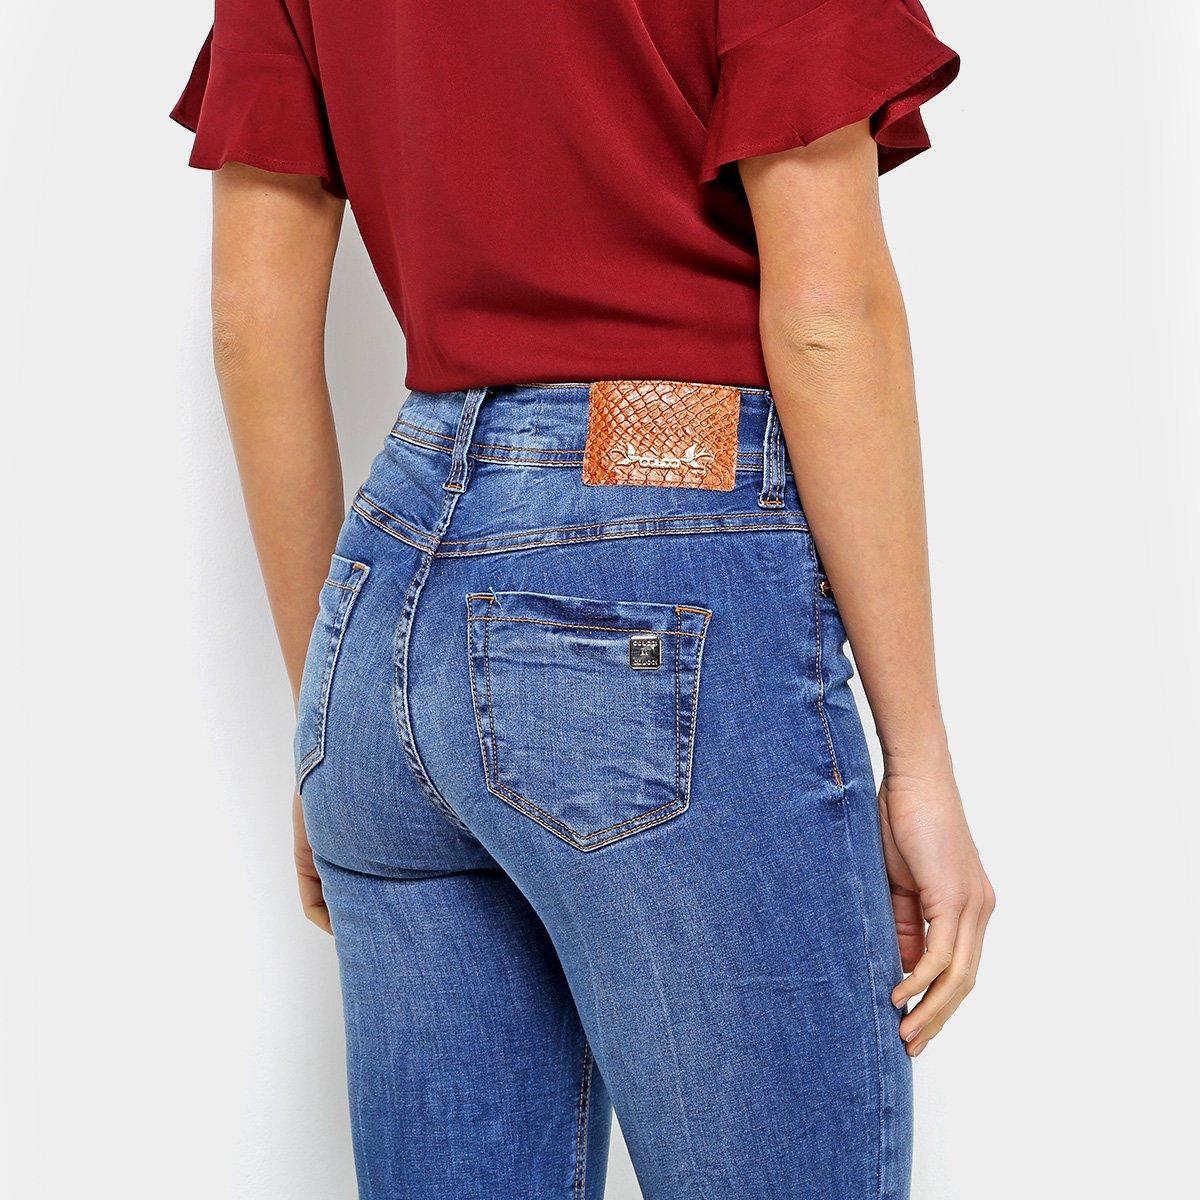 efbb6713f ... Calça Jeans Skinny Colcci Bia Estonada Puídos Barra Desfiada  Assimétrica Cintura Alta Feminina